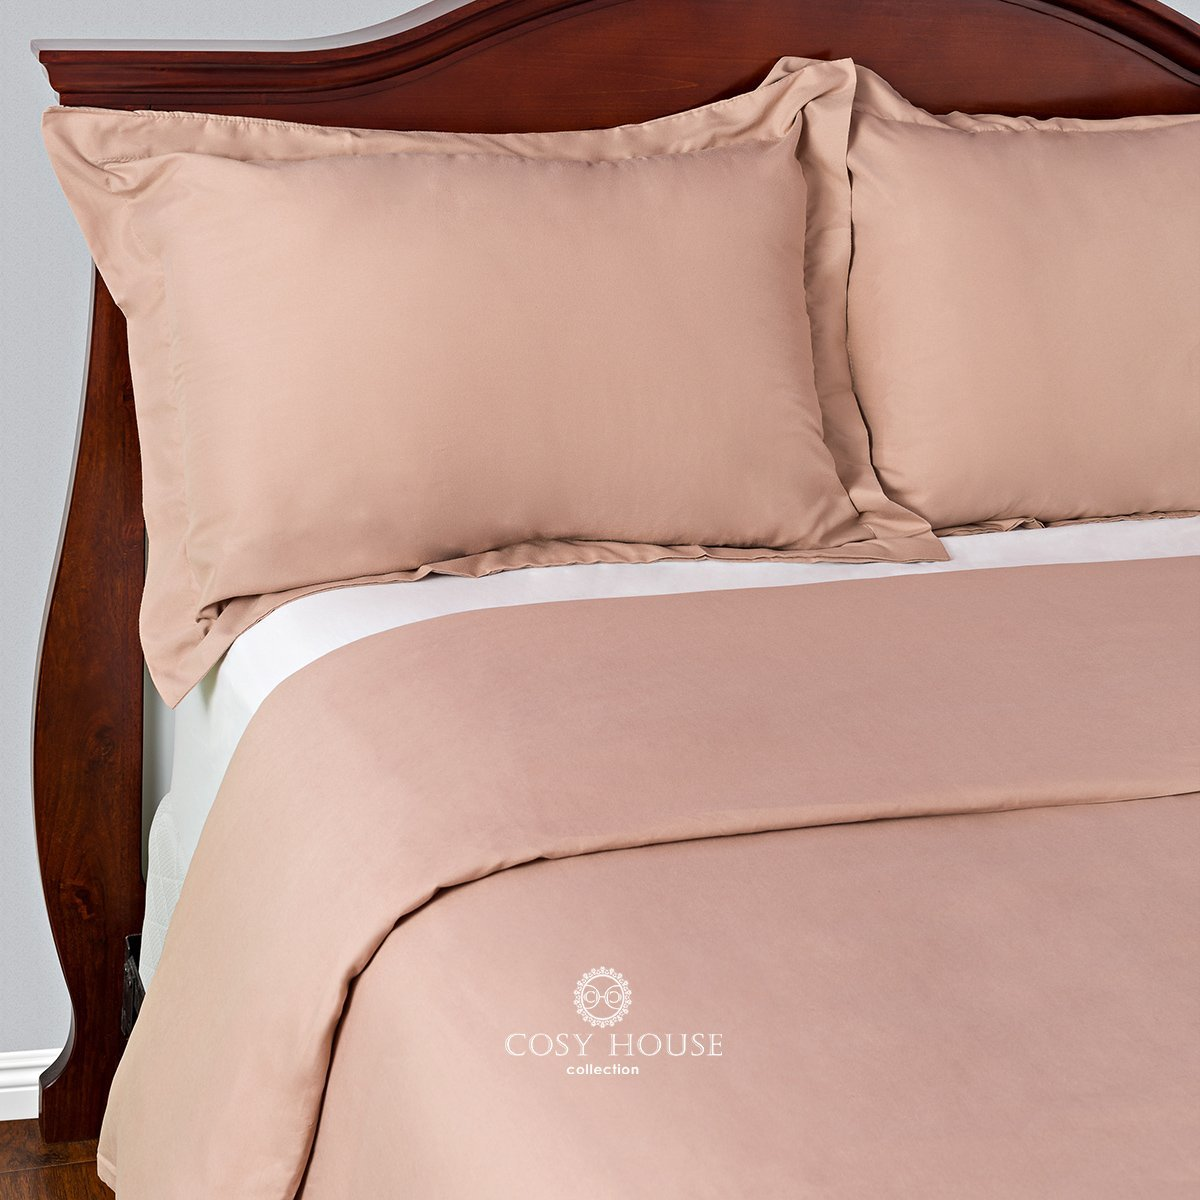 Best Duvet Covers Sets 3 Piece - 100% Microfiber - Most Durable Non-Rip Comforter Covers